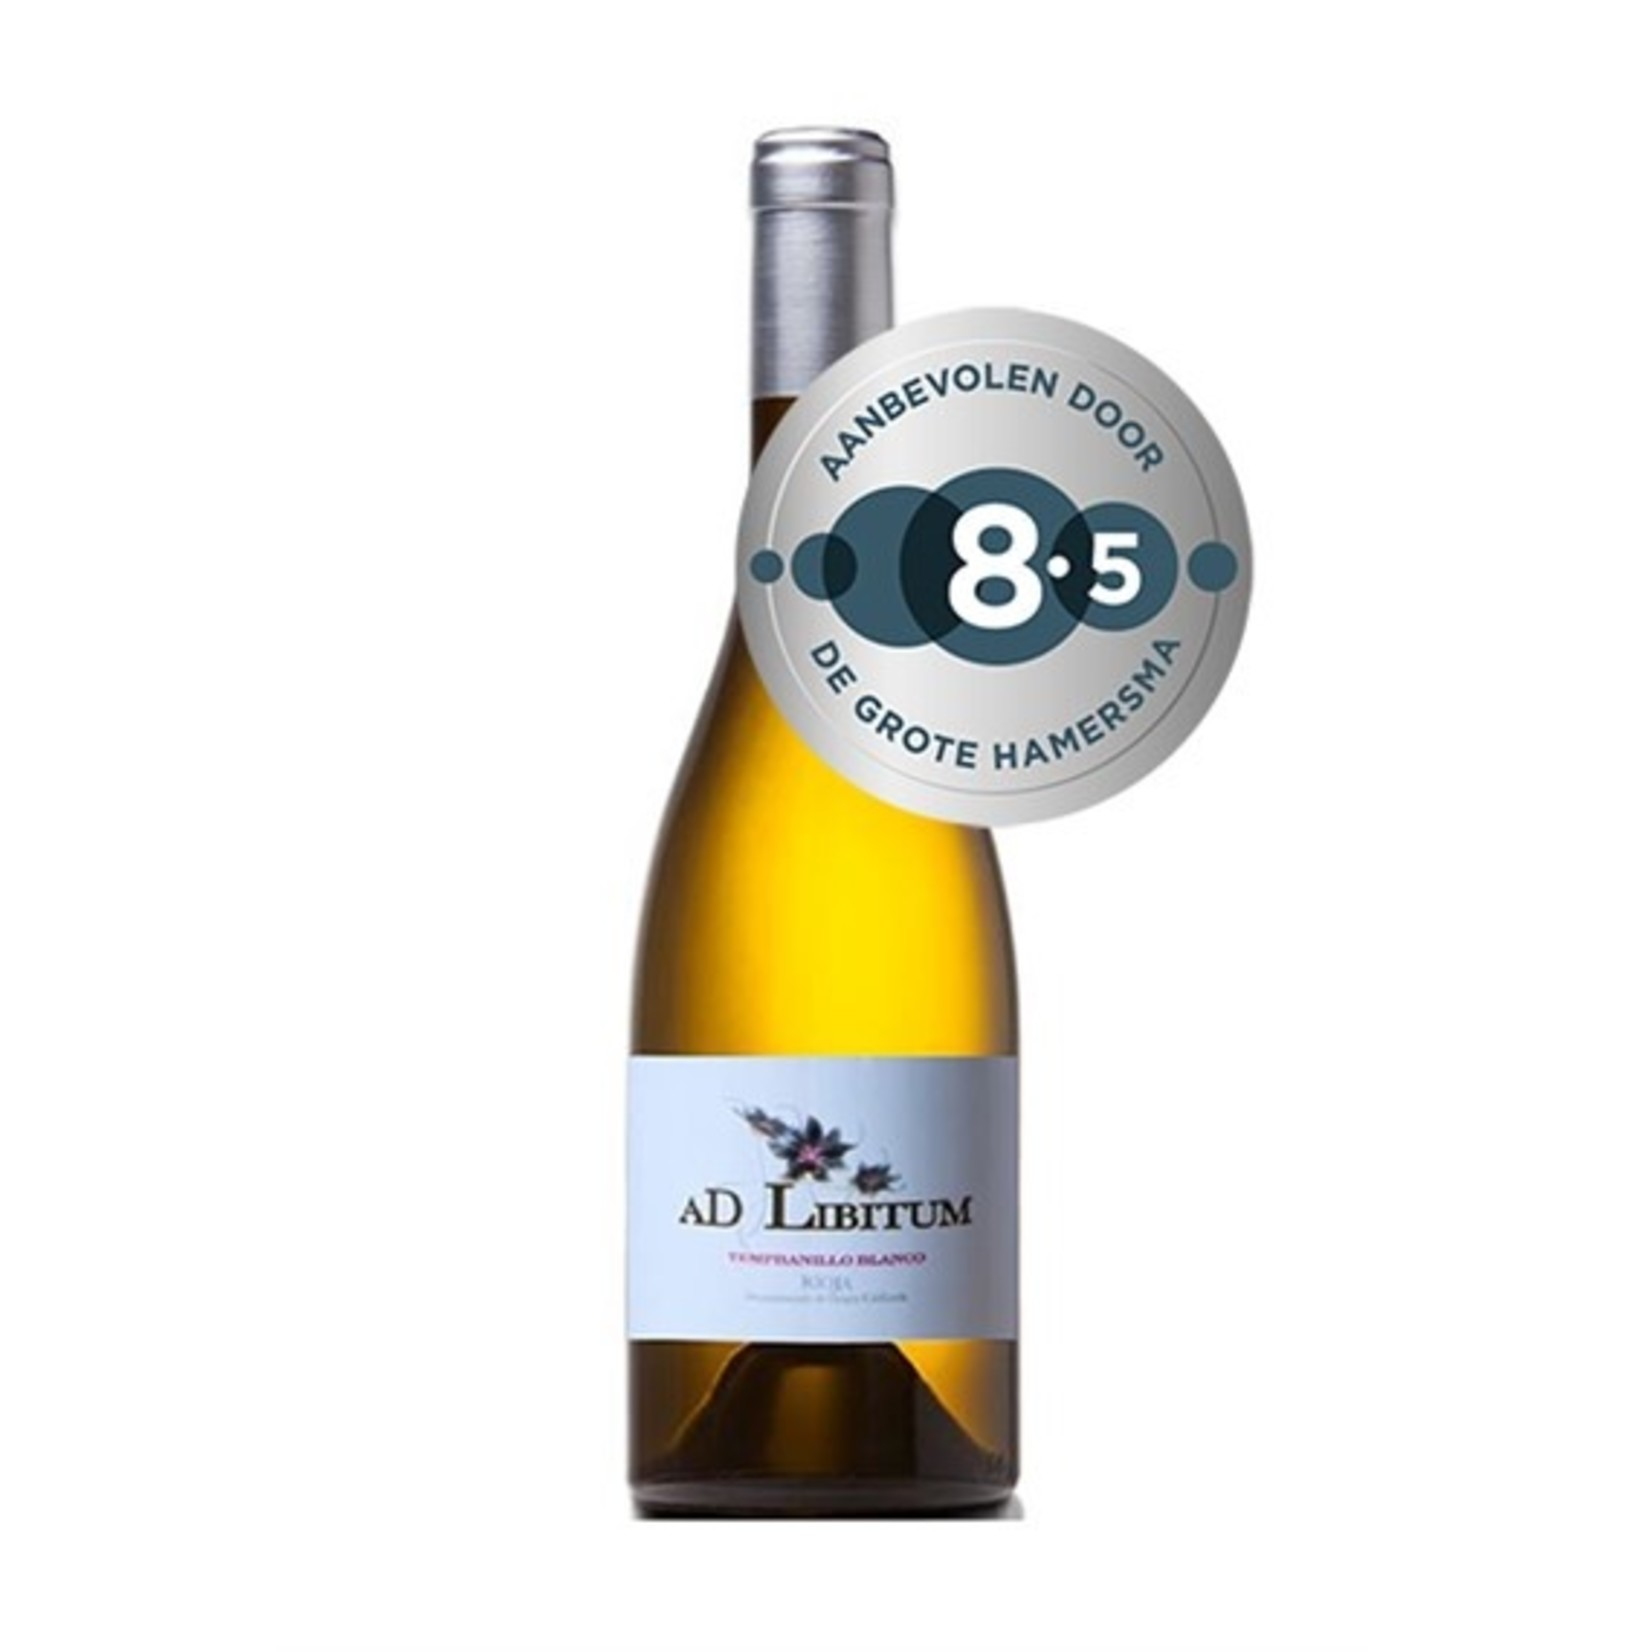 Ad Libitum Tempranillo Blanco, Rioja, Juan Carlos Sancha, 2018